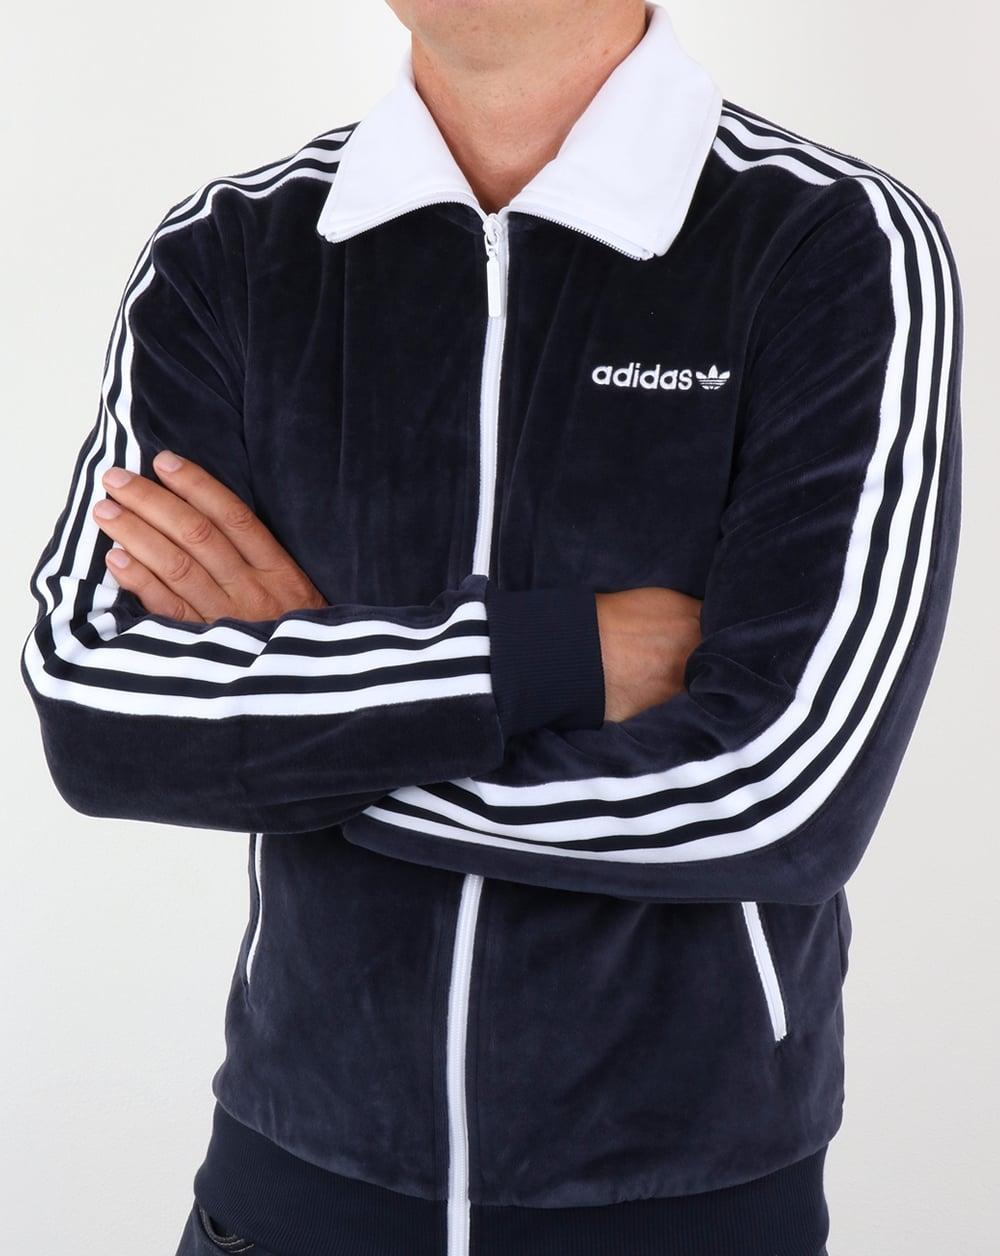 Adidas Originals SST Track Jacket Mens Clothing Legend